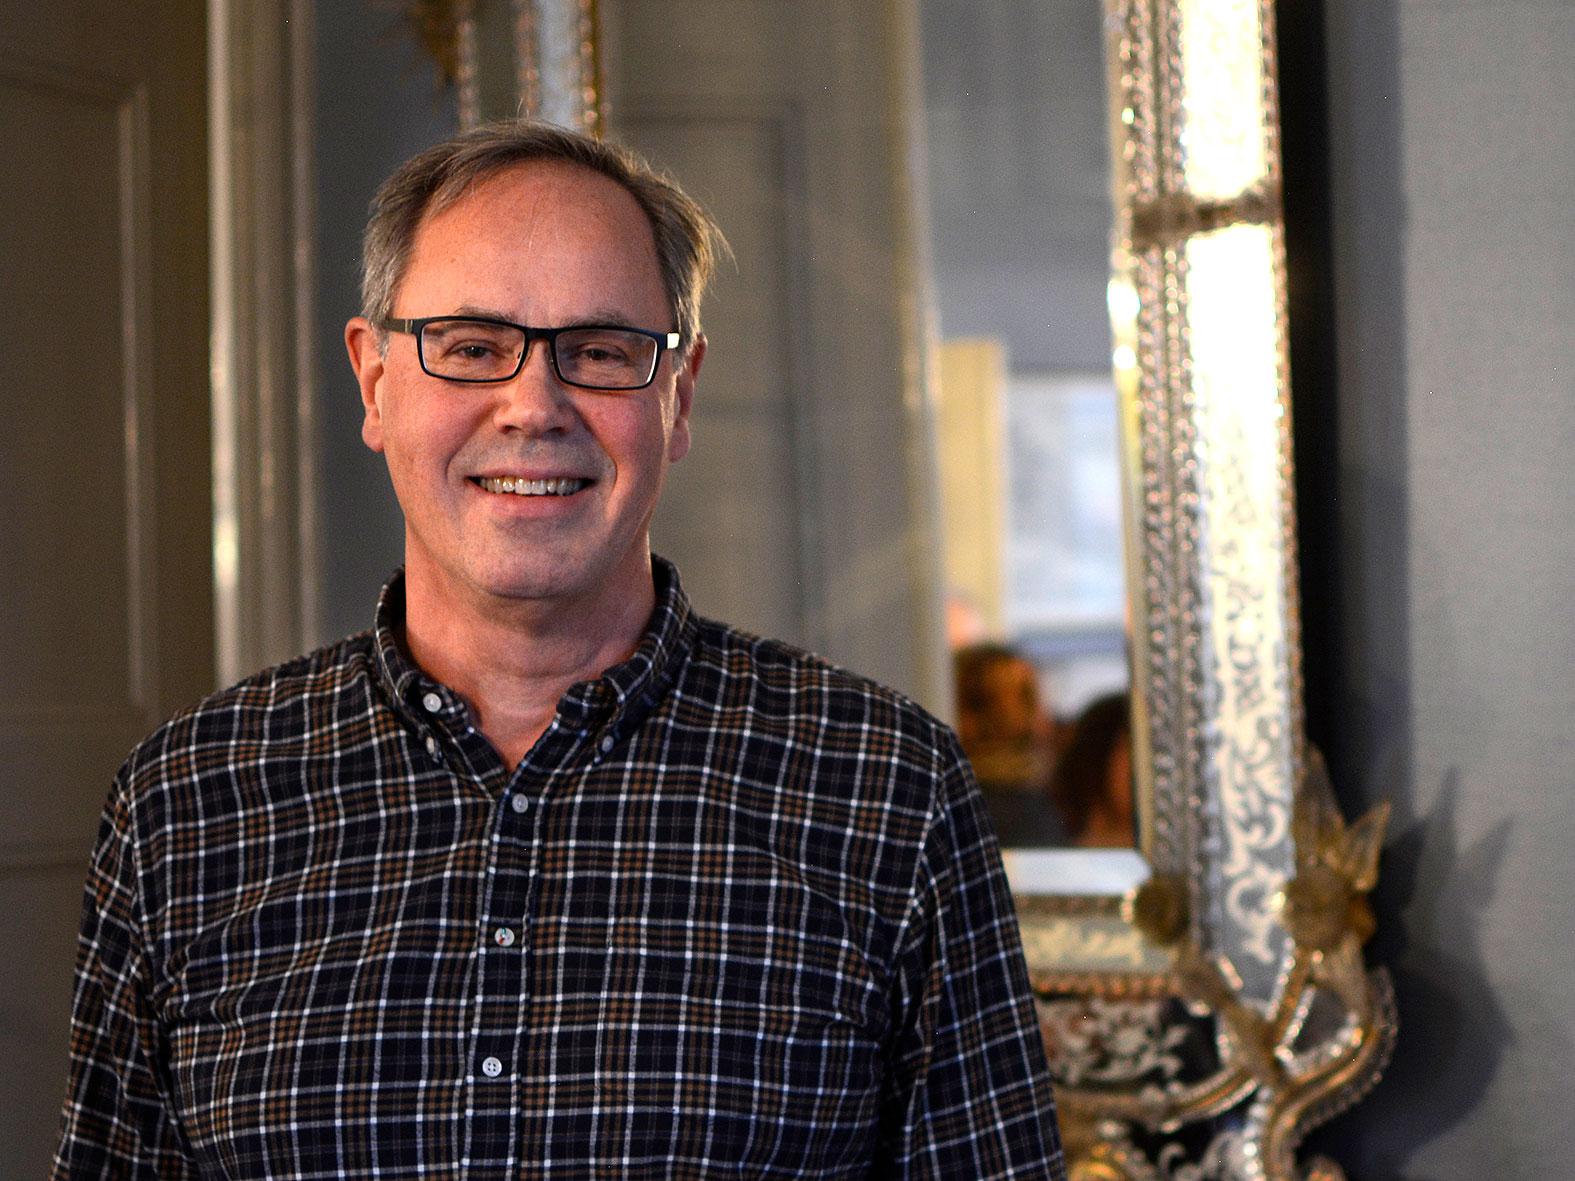 Per-Olof Lind